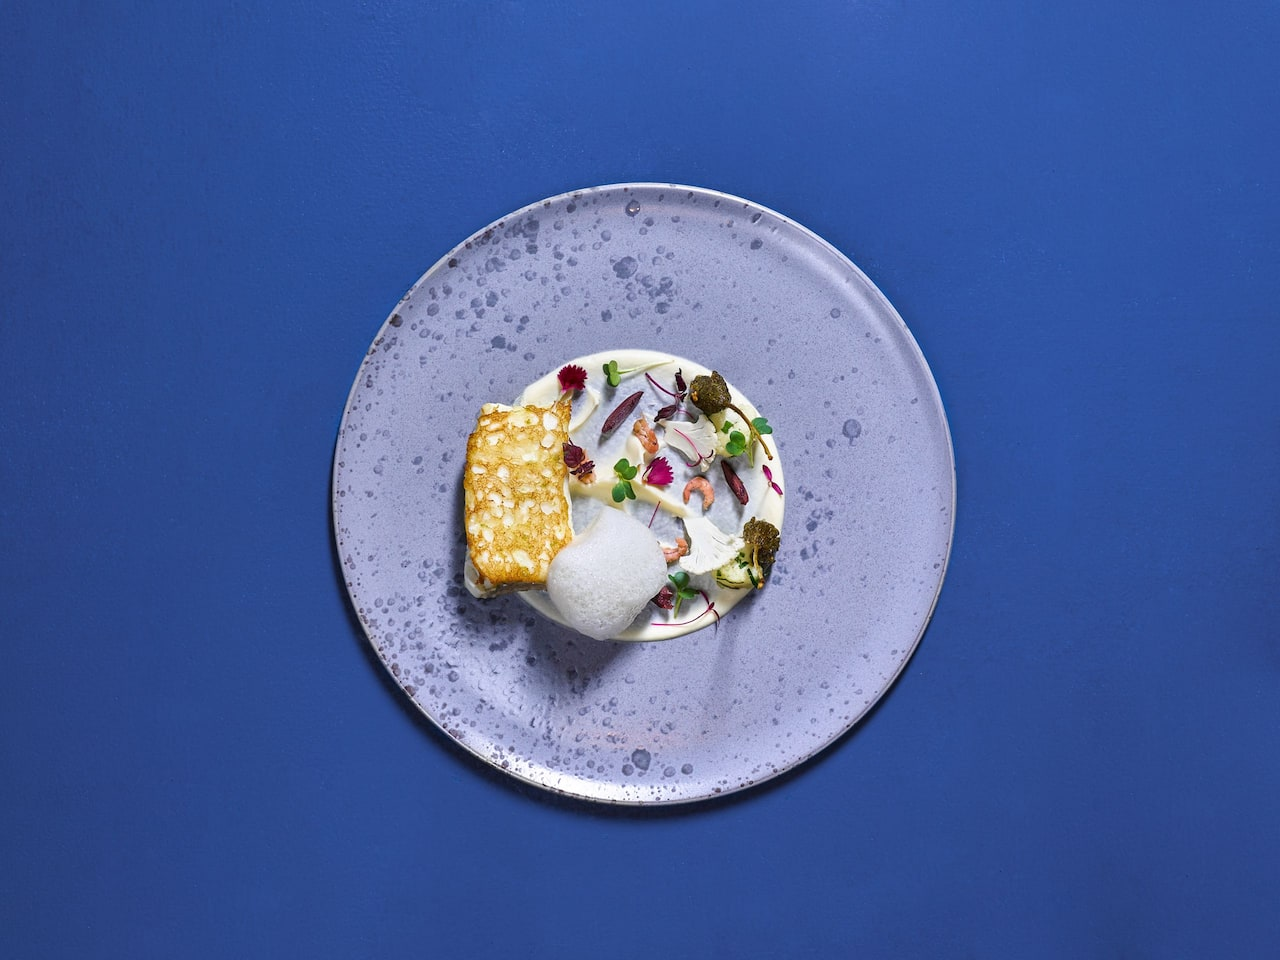 Bluespoon Chef Sander Signature Dish